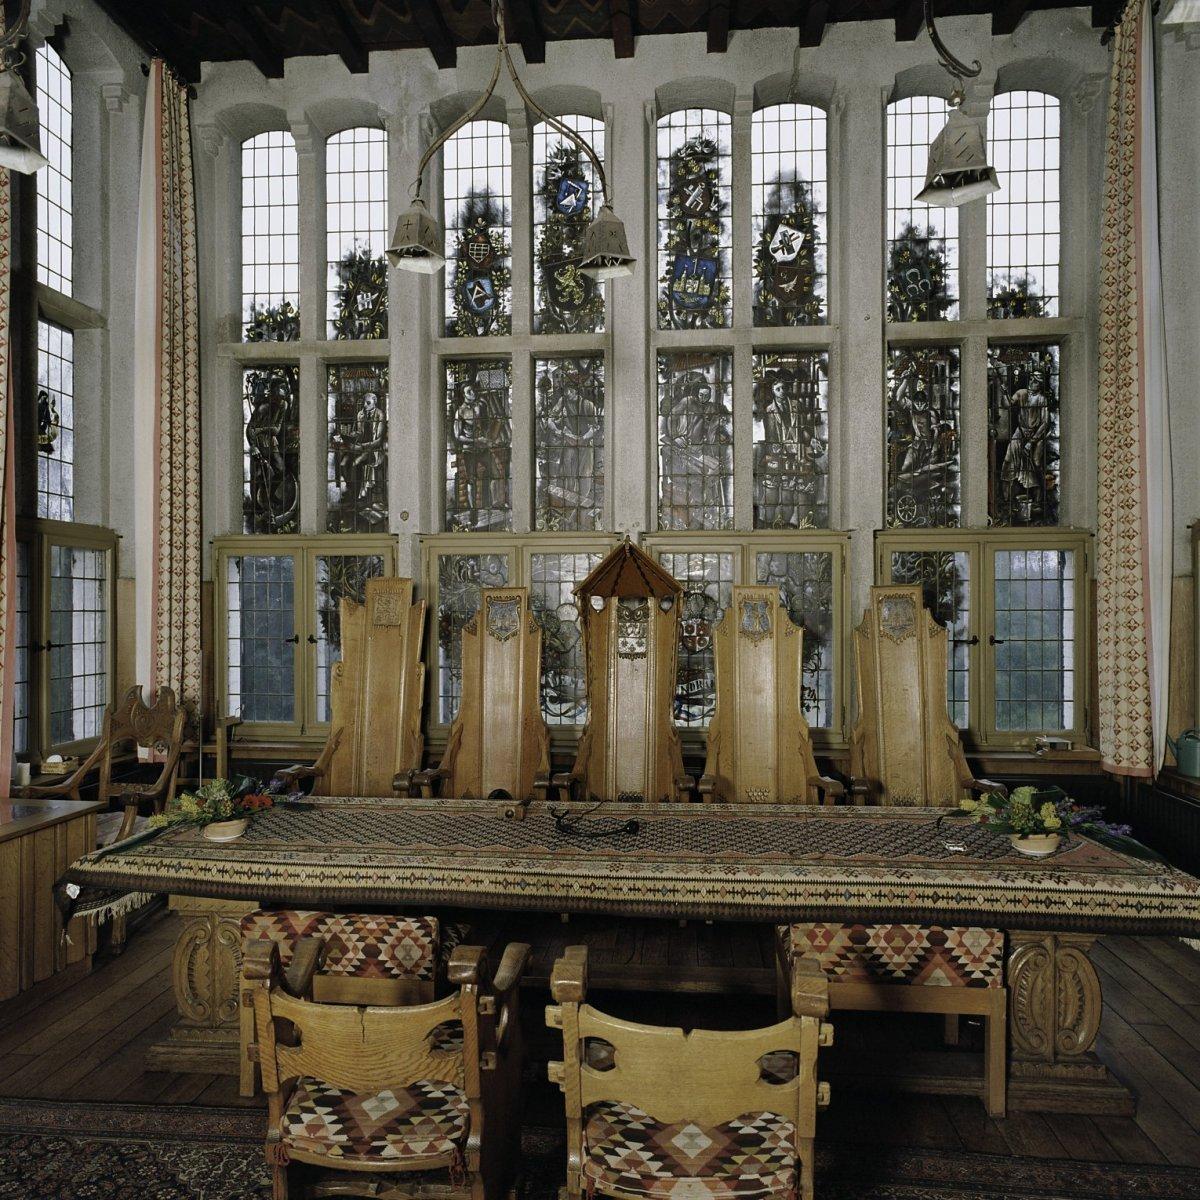 File:Interieur raadszaal, glas-in-loodramen - Vught - 20388077 - RCE ...